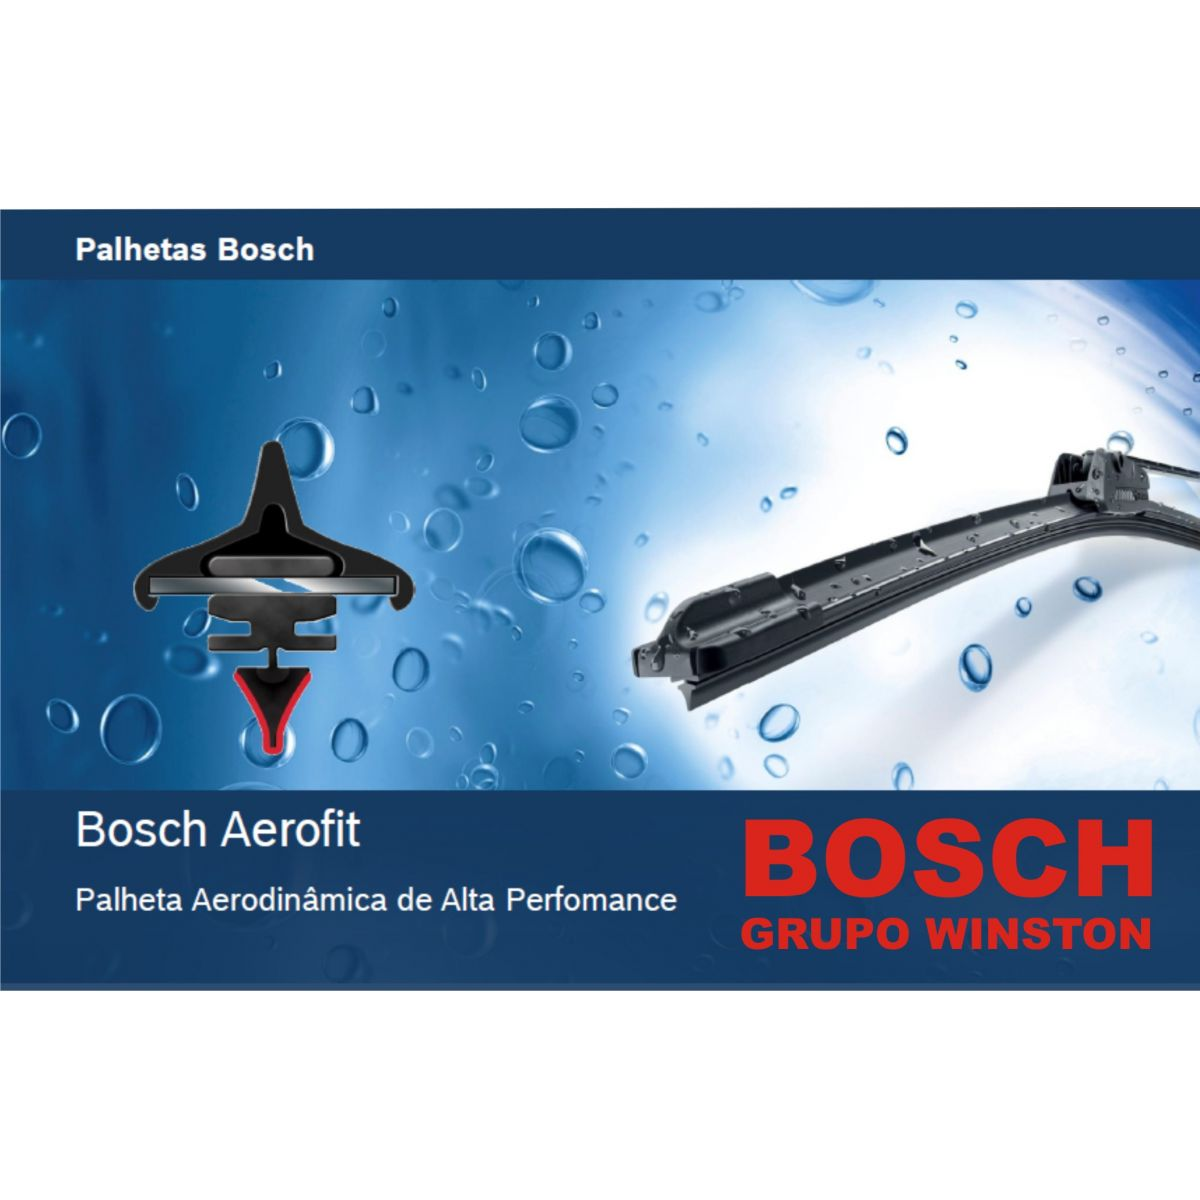 Palheta Bosch Aerofit Limpador de para brisa Bosch LAND ROVER Range Rover II